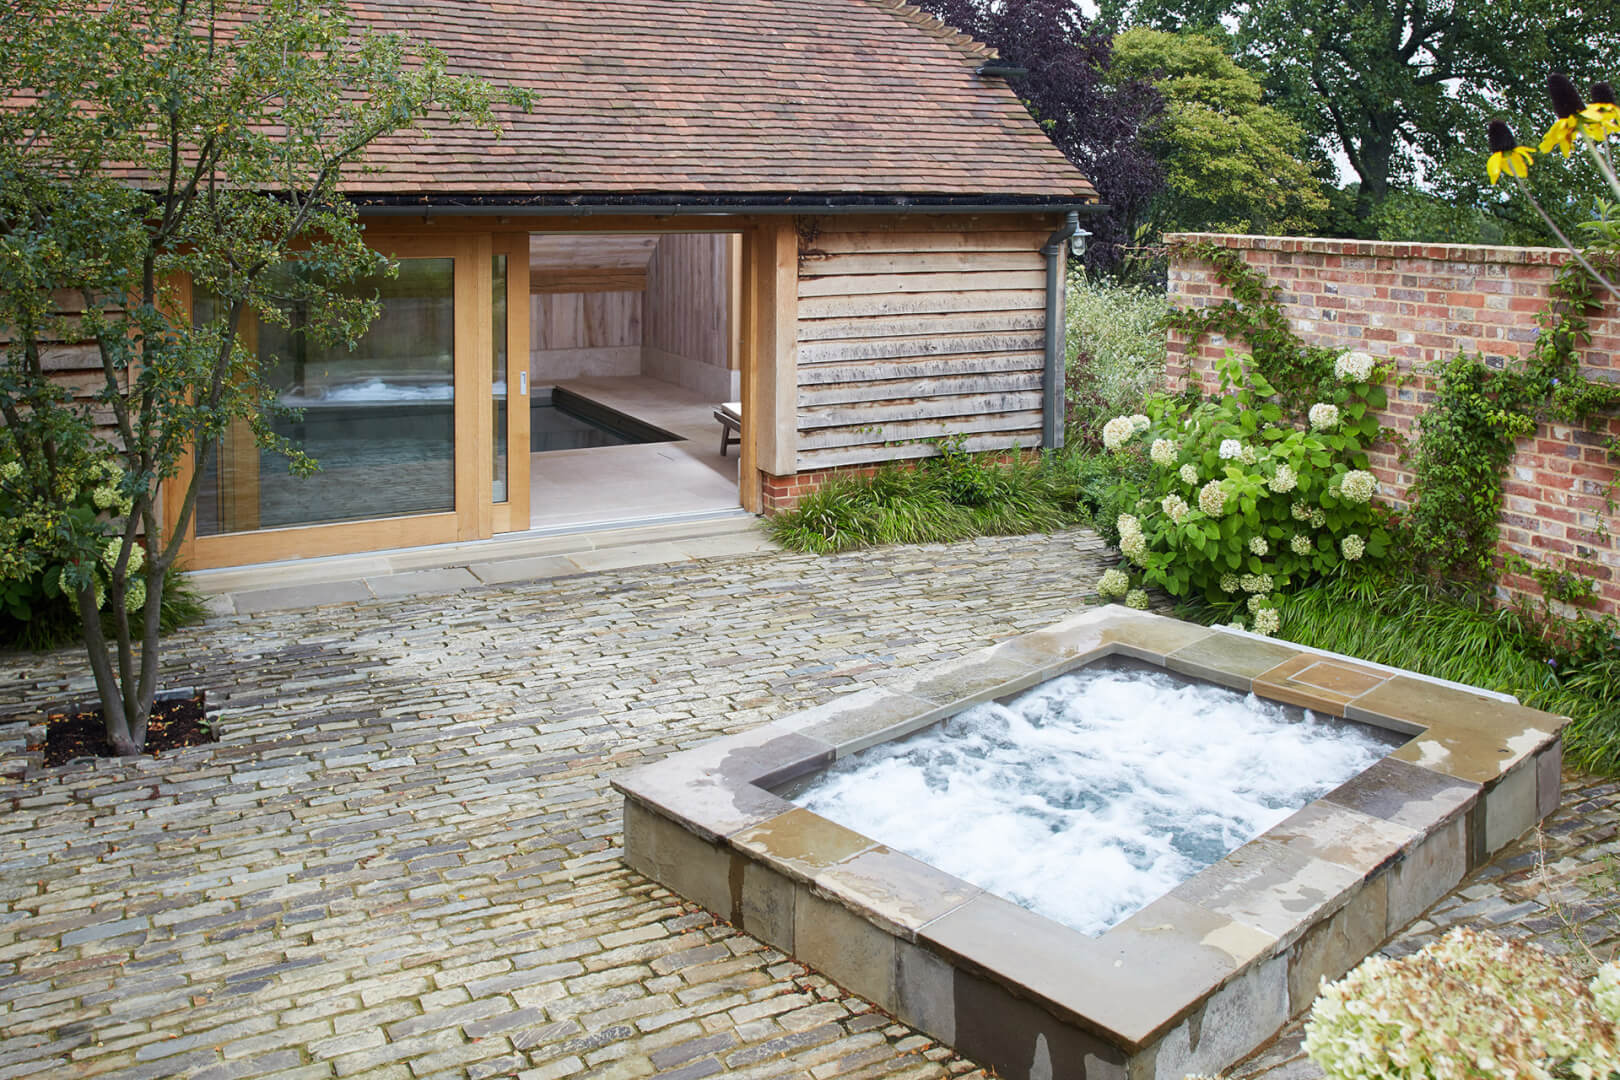 Outdoor spa pool by Guncast